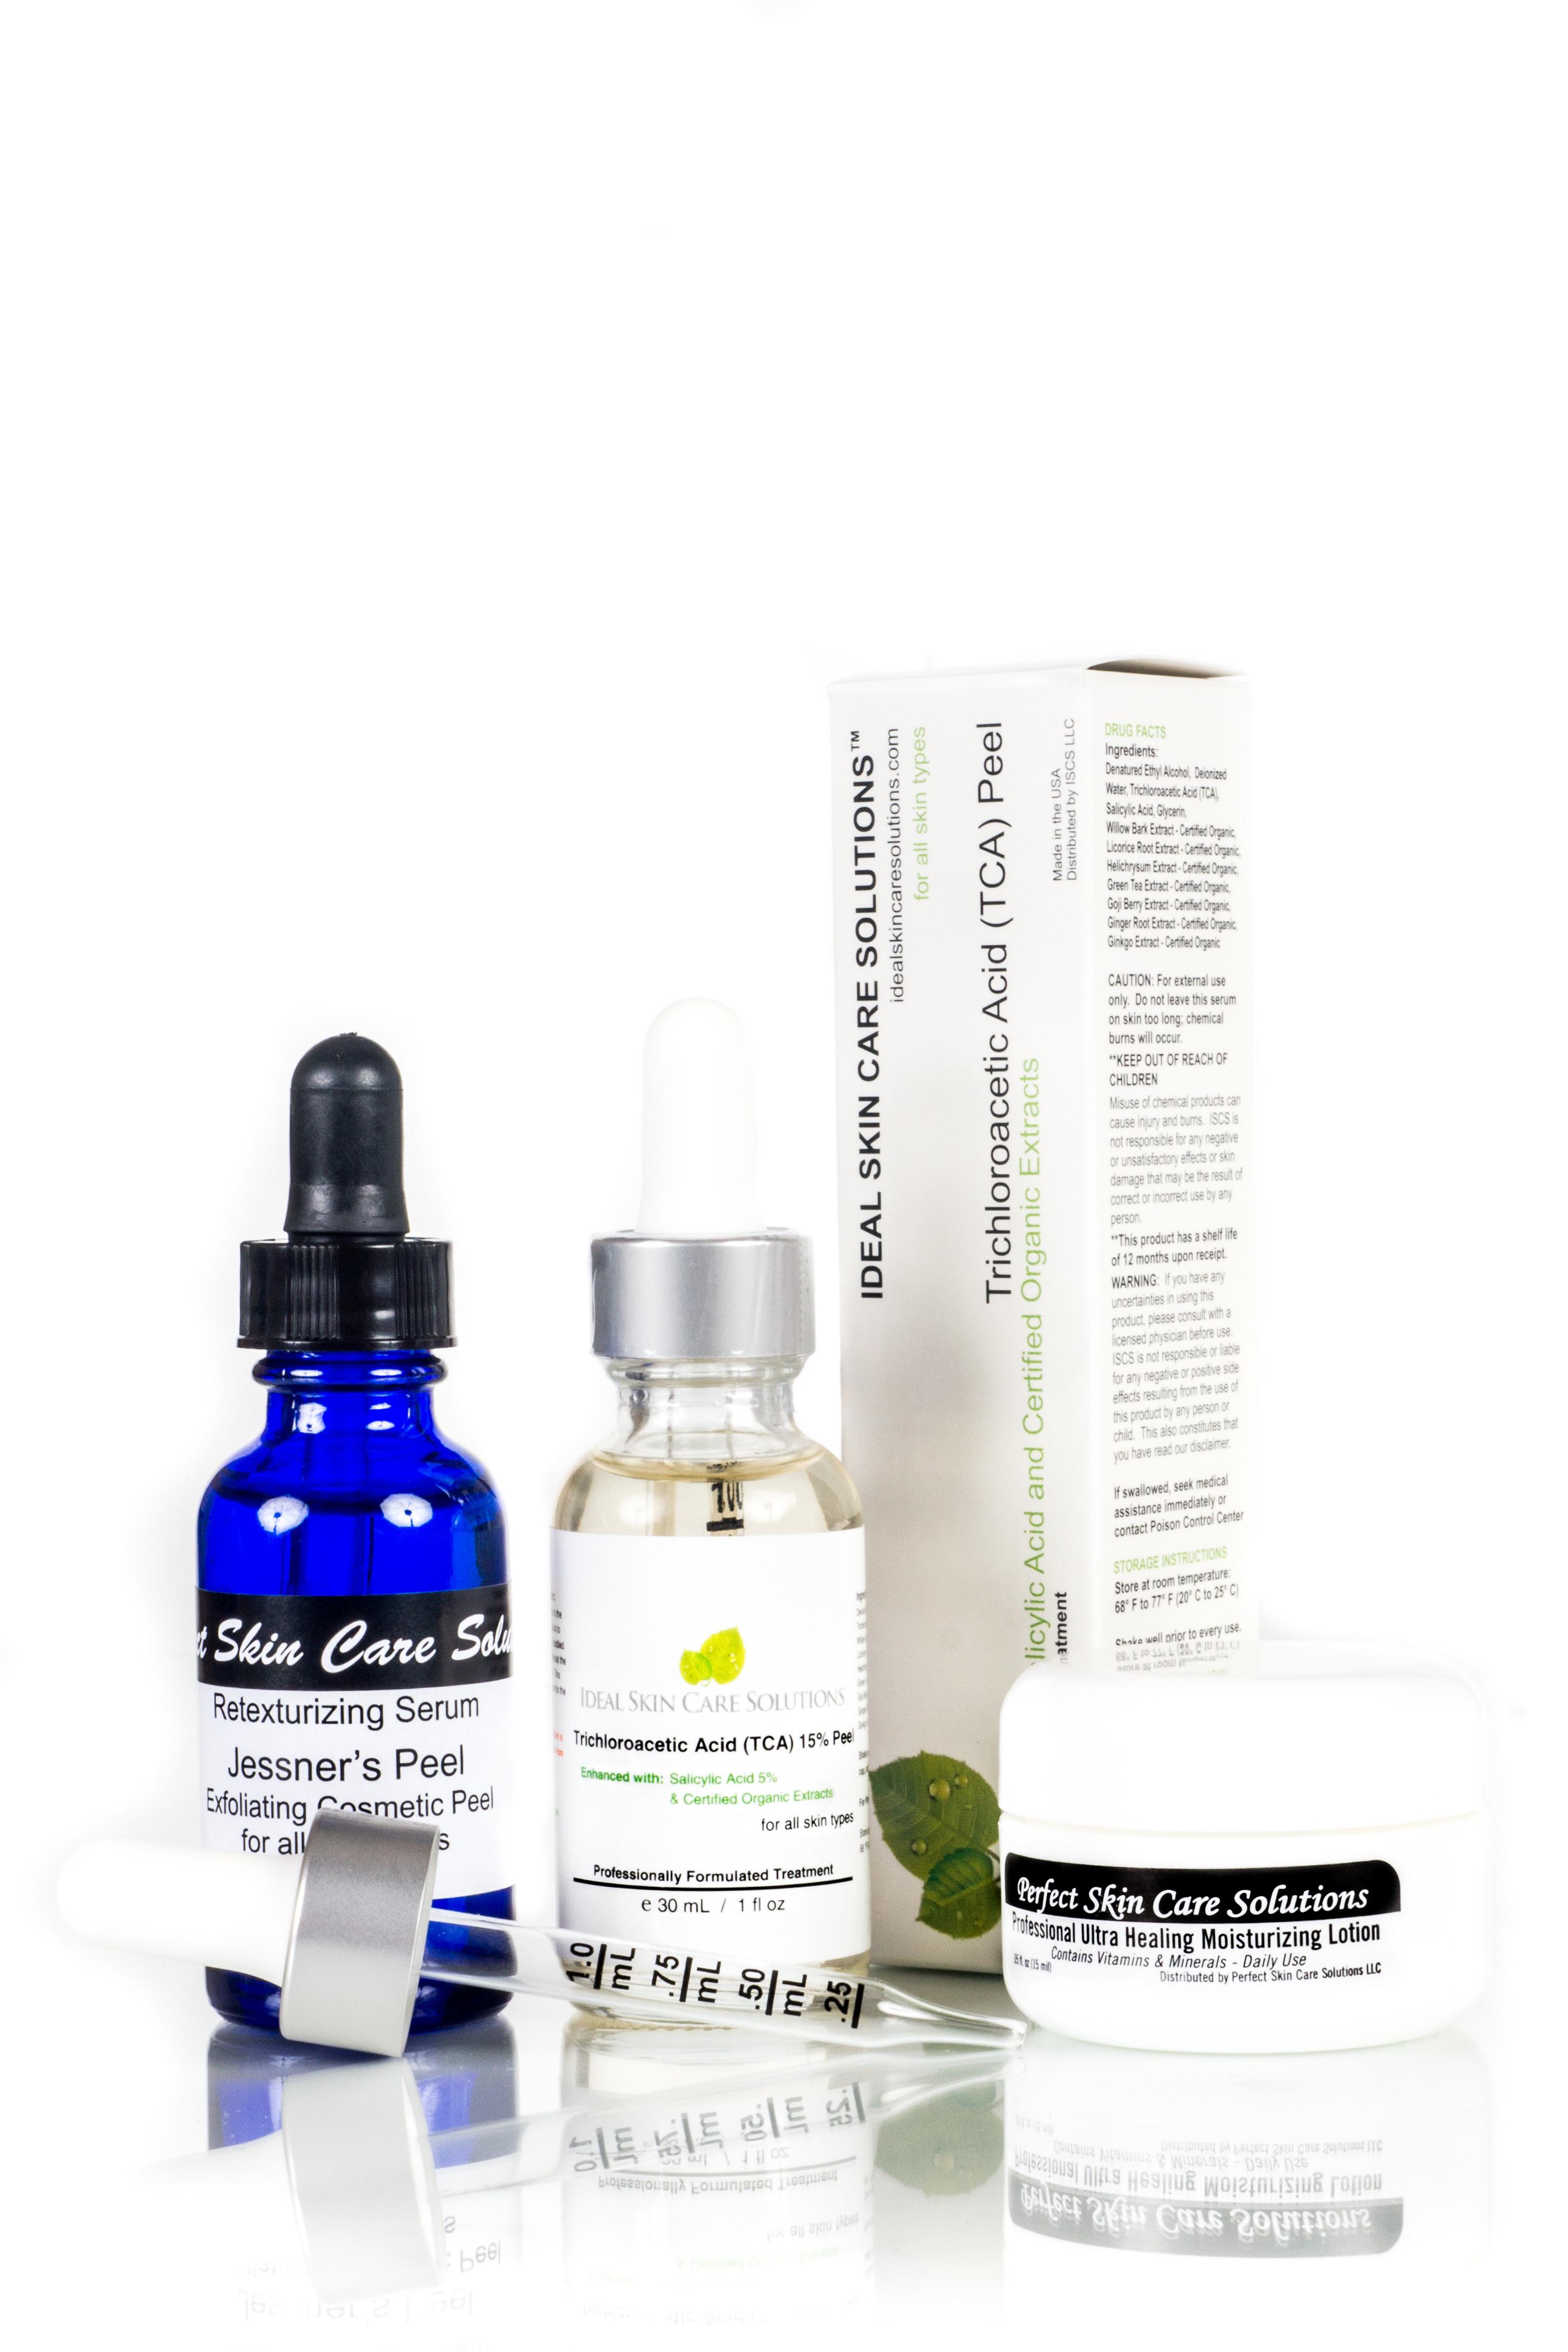 Tca 15 Peel Enhanced With 5 Salicylic Acid With Usda Certified